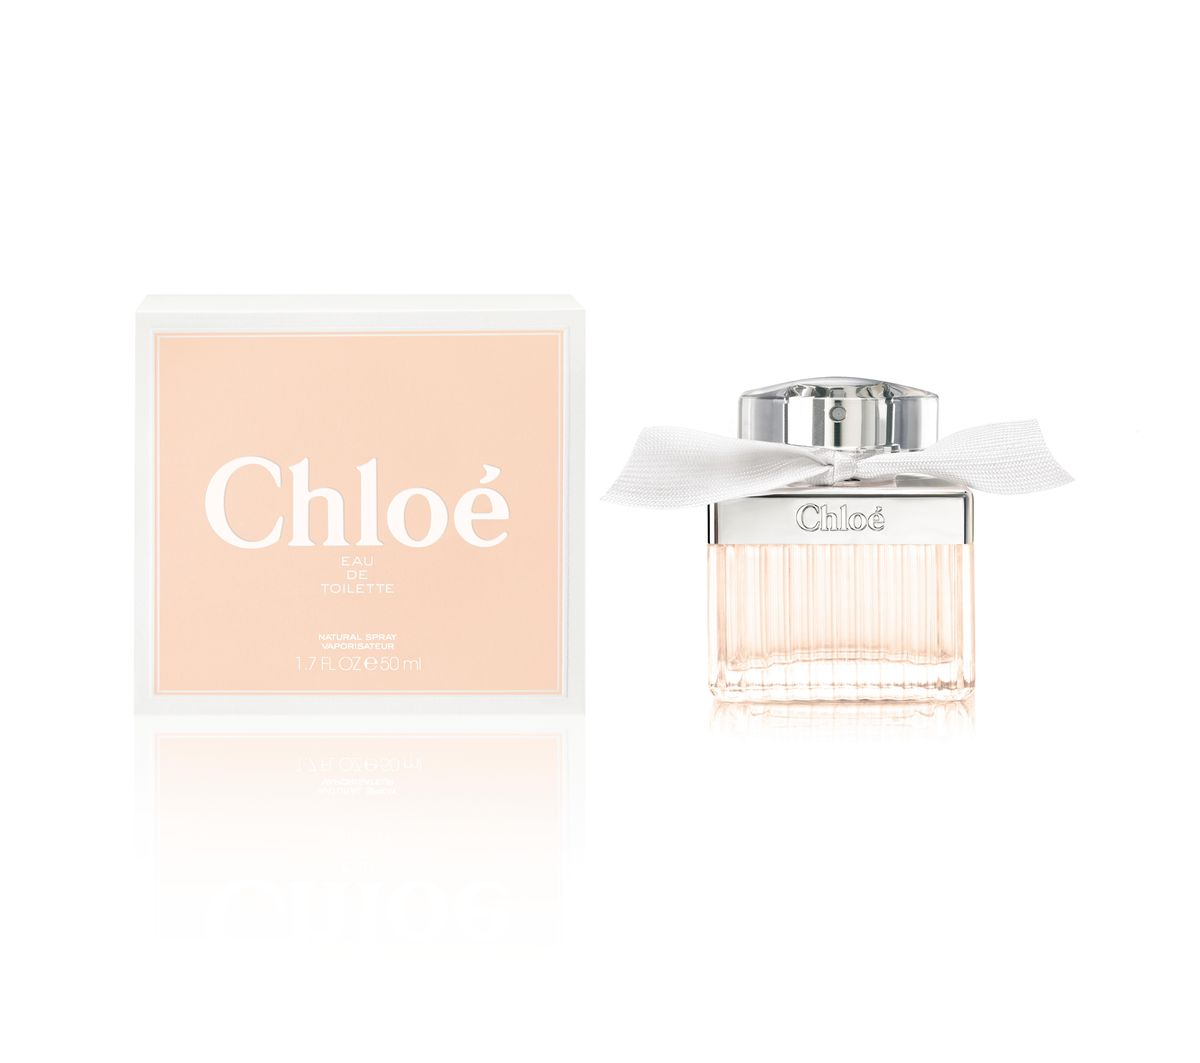 Chloe Signature Туалетная вода женская, 50 мл туалетная вода chloe chloe love story eau sensuelle парфюмерная вода 30 мл